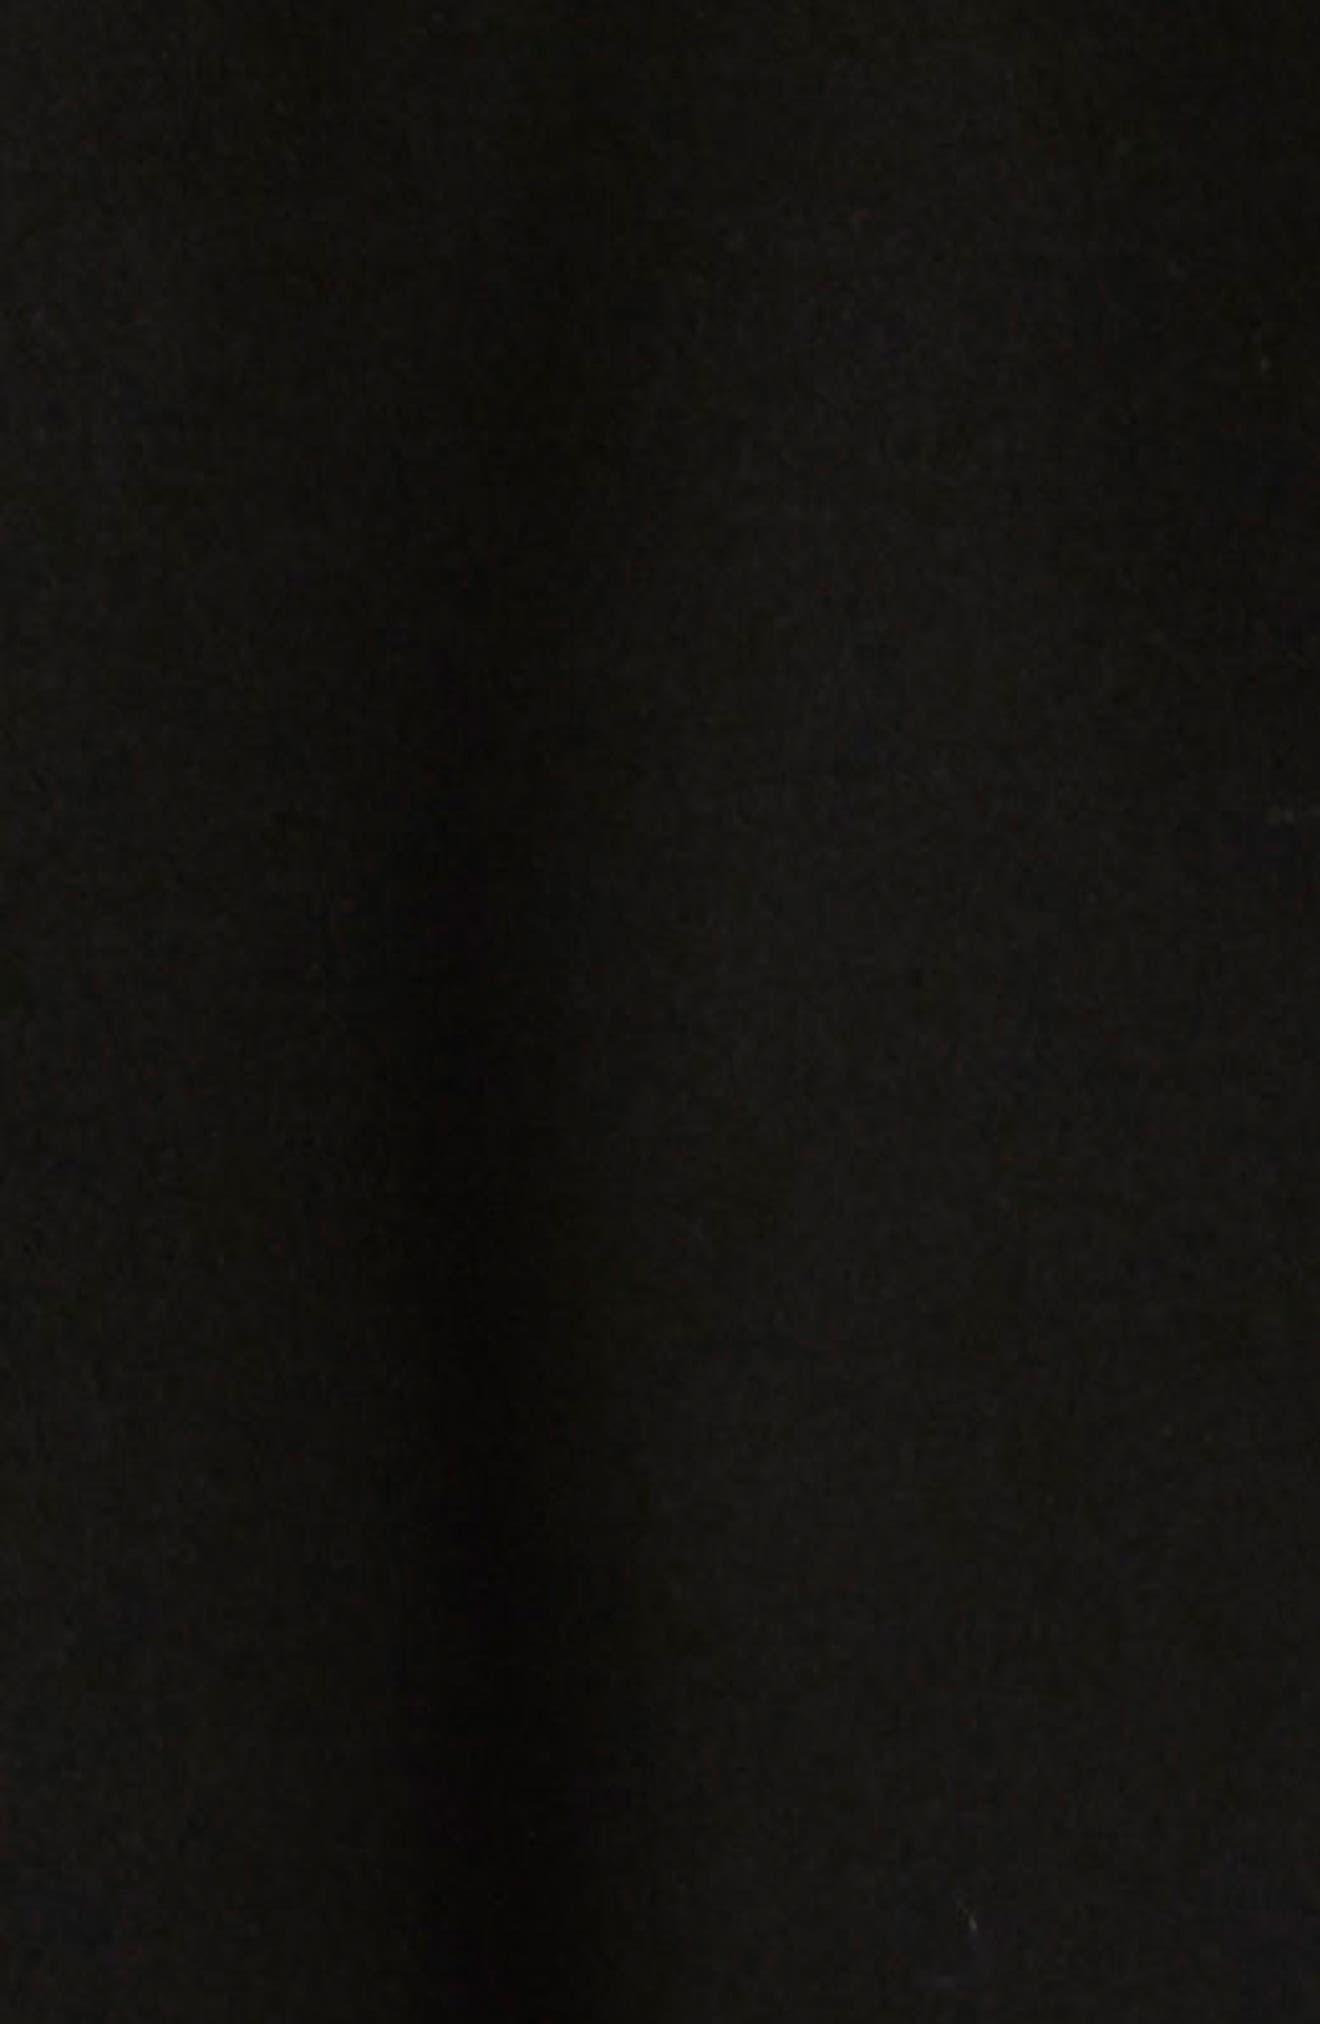 Fit & Flare Peacoat with Removable Faux Fur Trim,                             Alternate thumbnail 4, color,                             Black